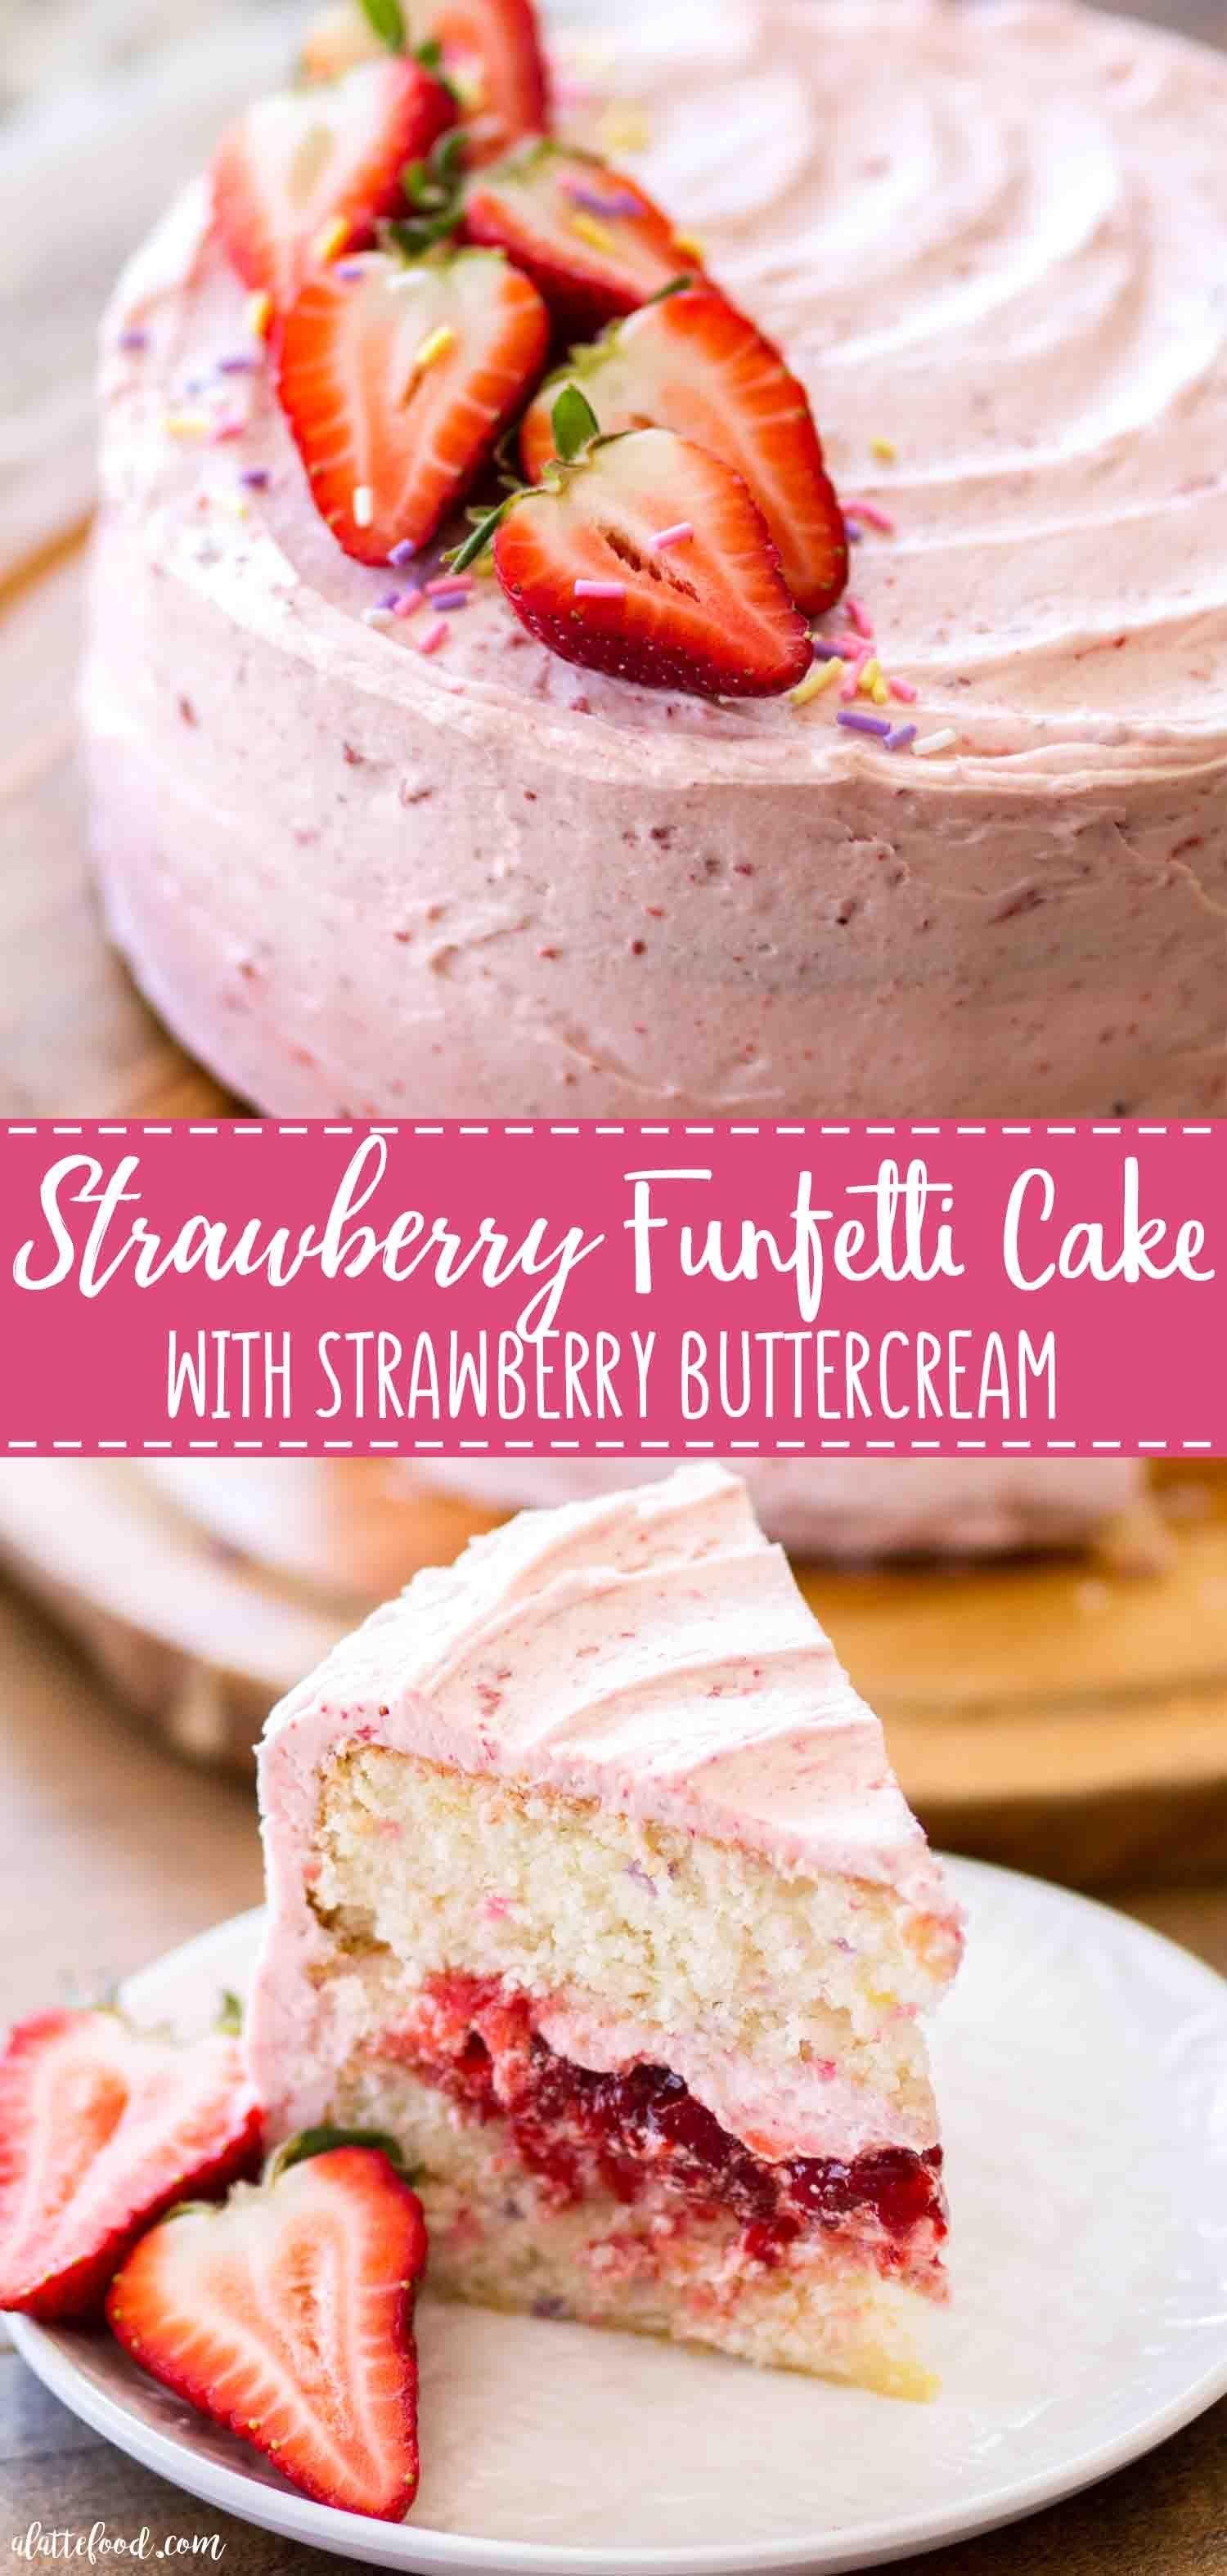 Strawberry Funfetti Cake with Strawberry Buttercream